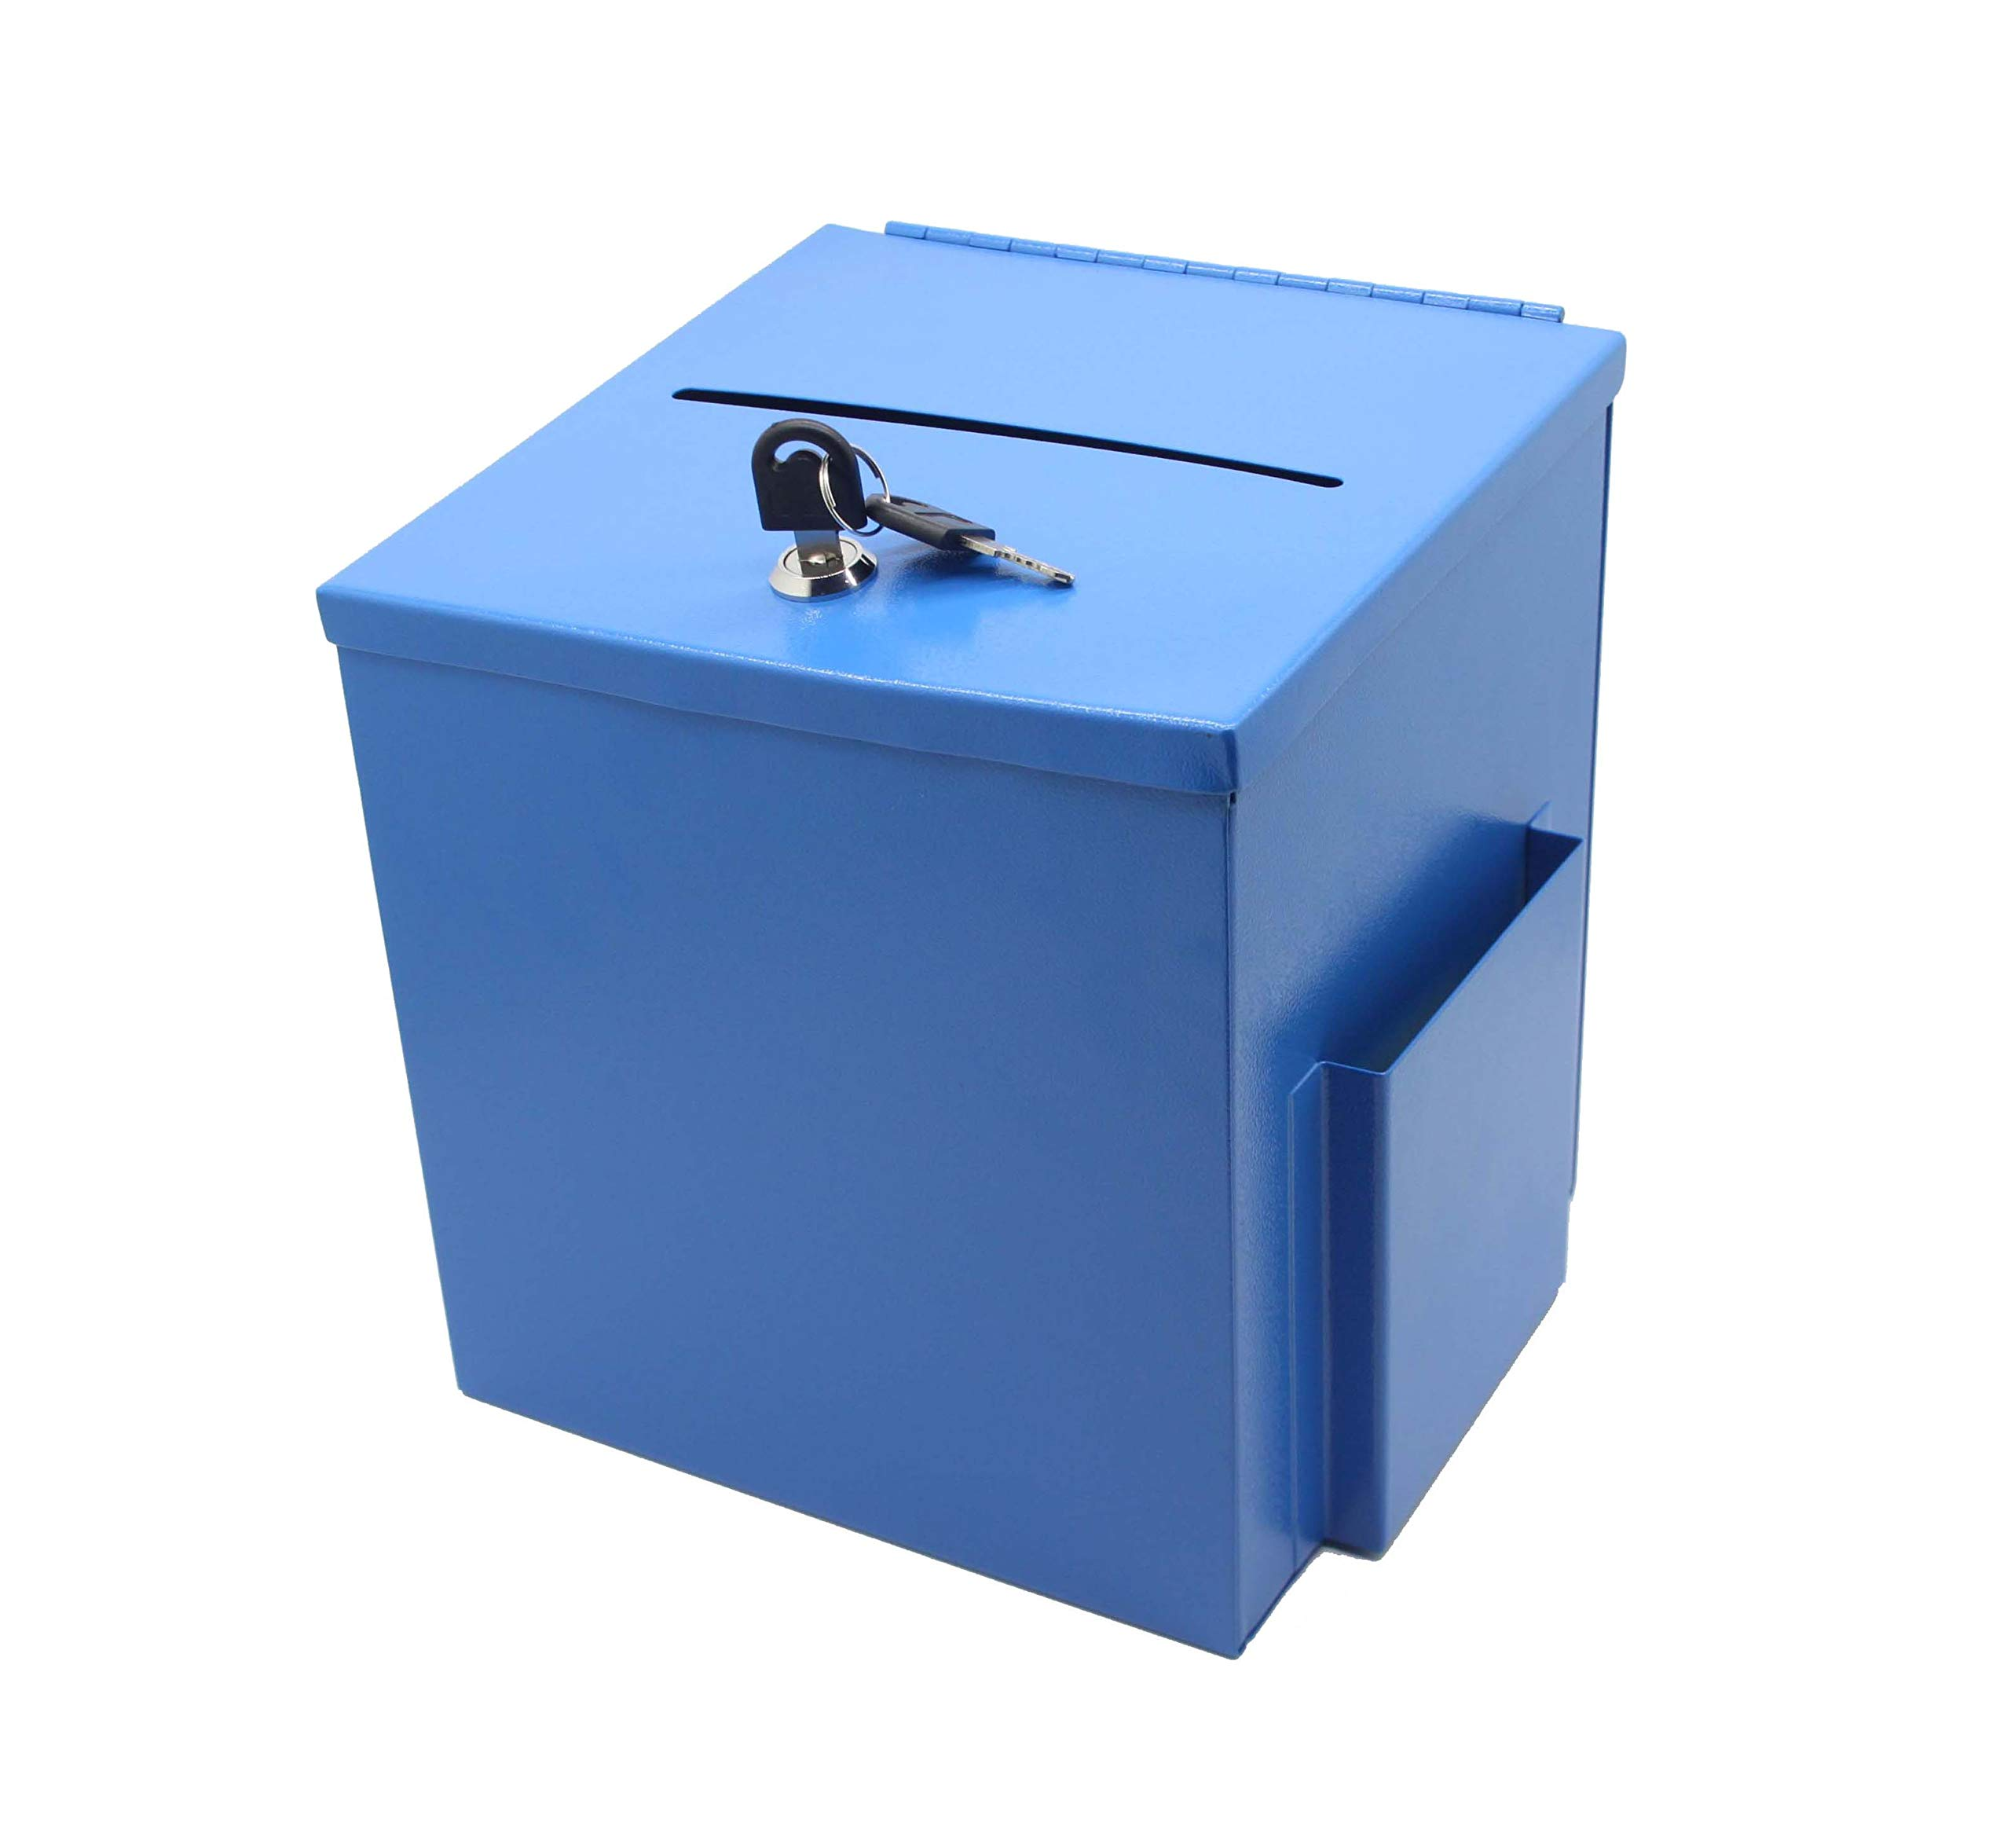 Blue Metal Donation Box Suggestion Box 10918-BLUE by FixtureDisplays